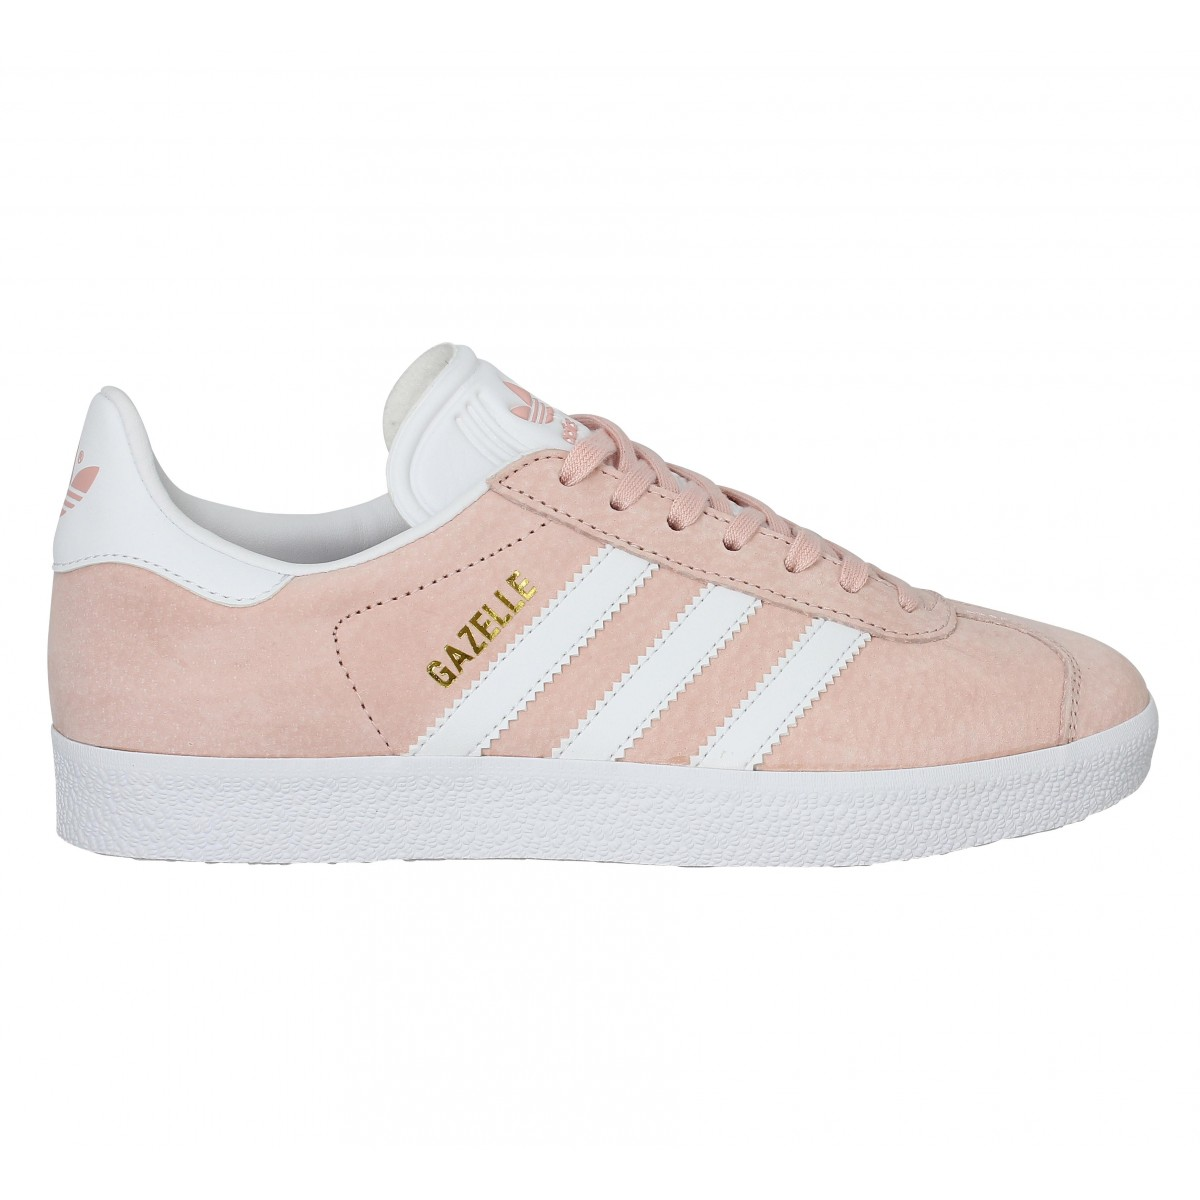 adidas gazelle femme blanche et rose